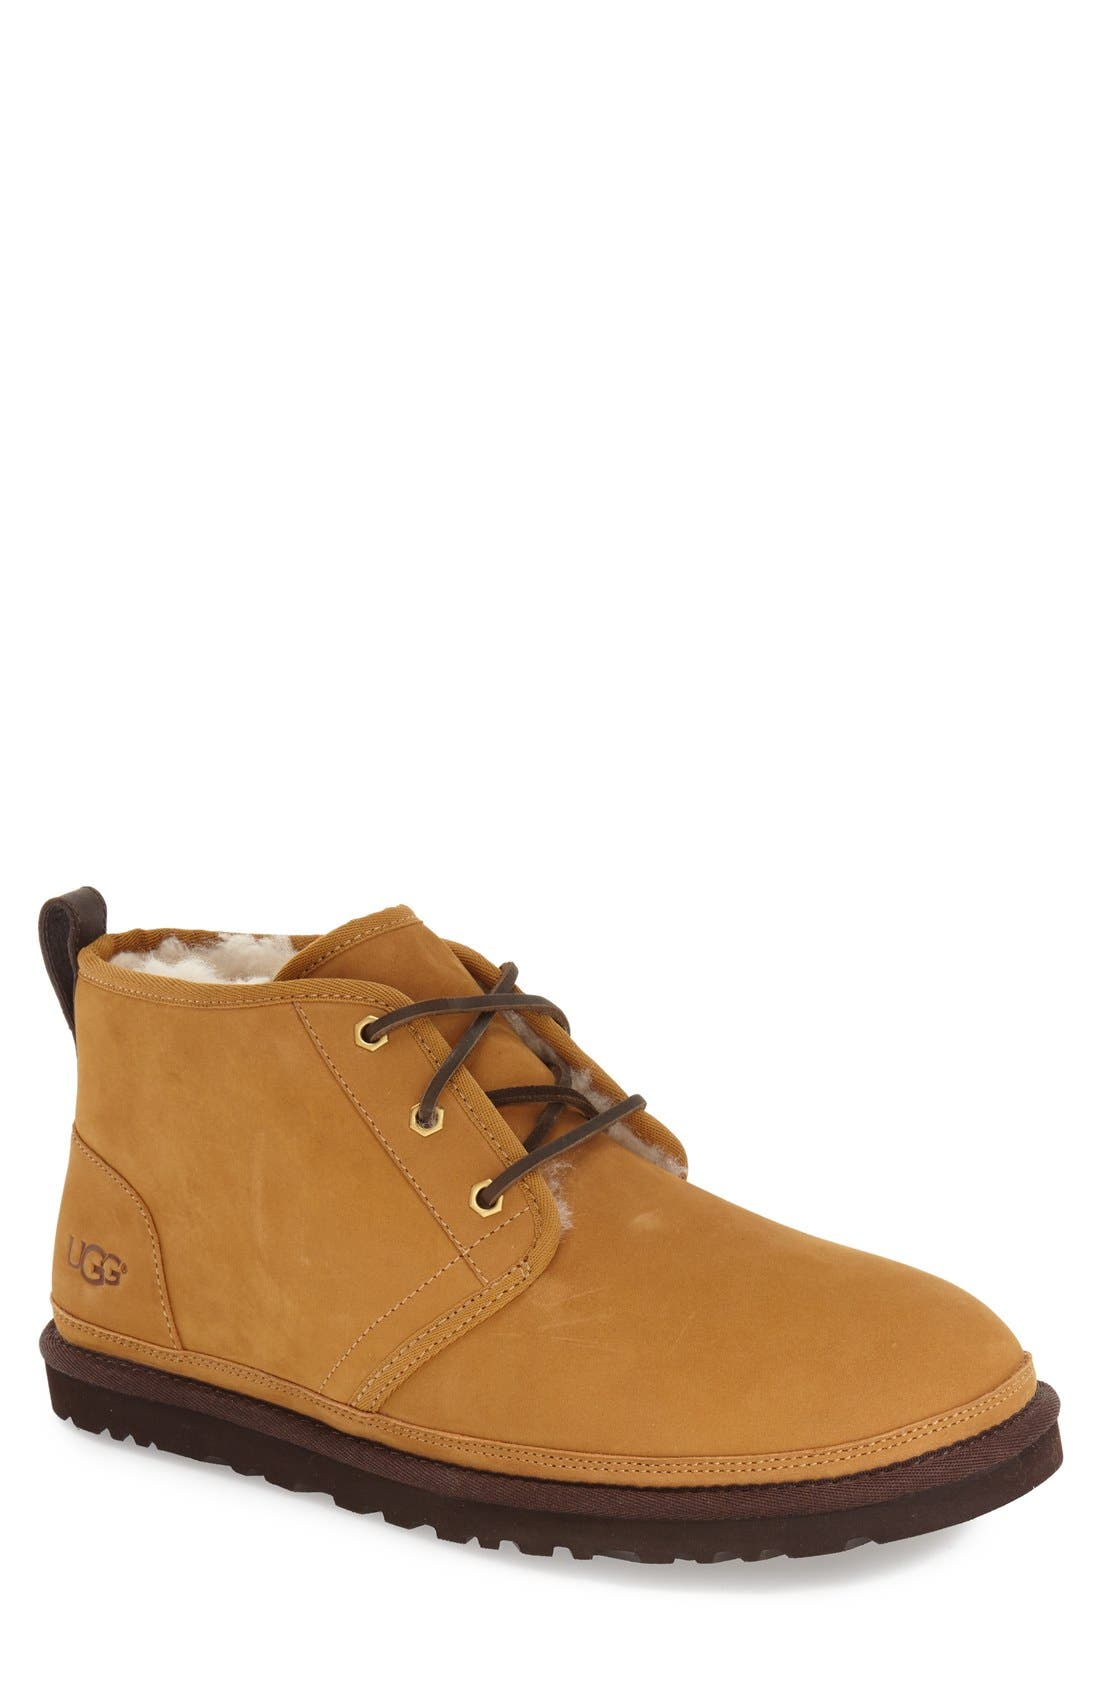 Main Image - UGG® Neumel Chukka Boot (Men)